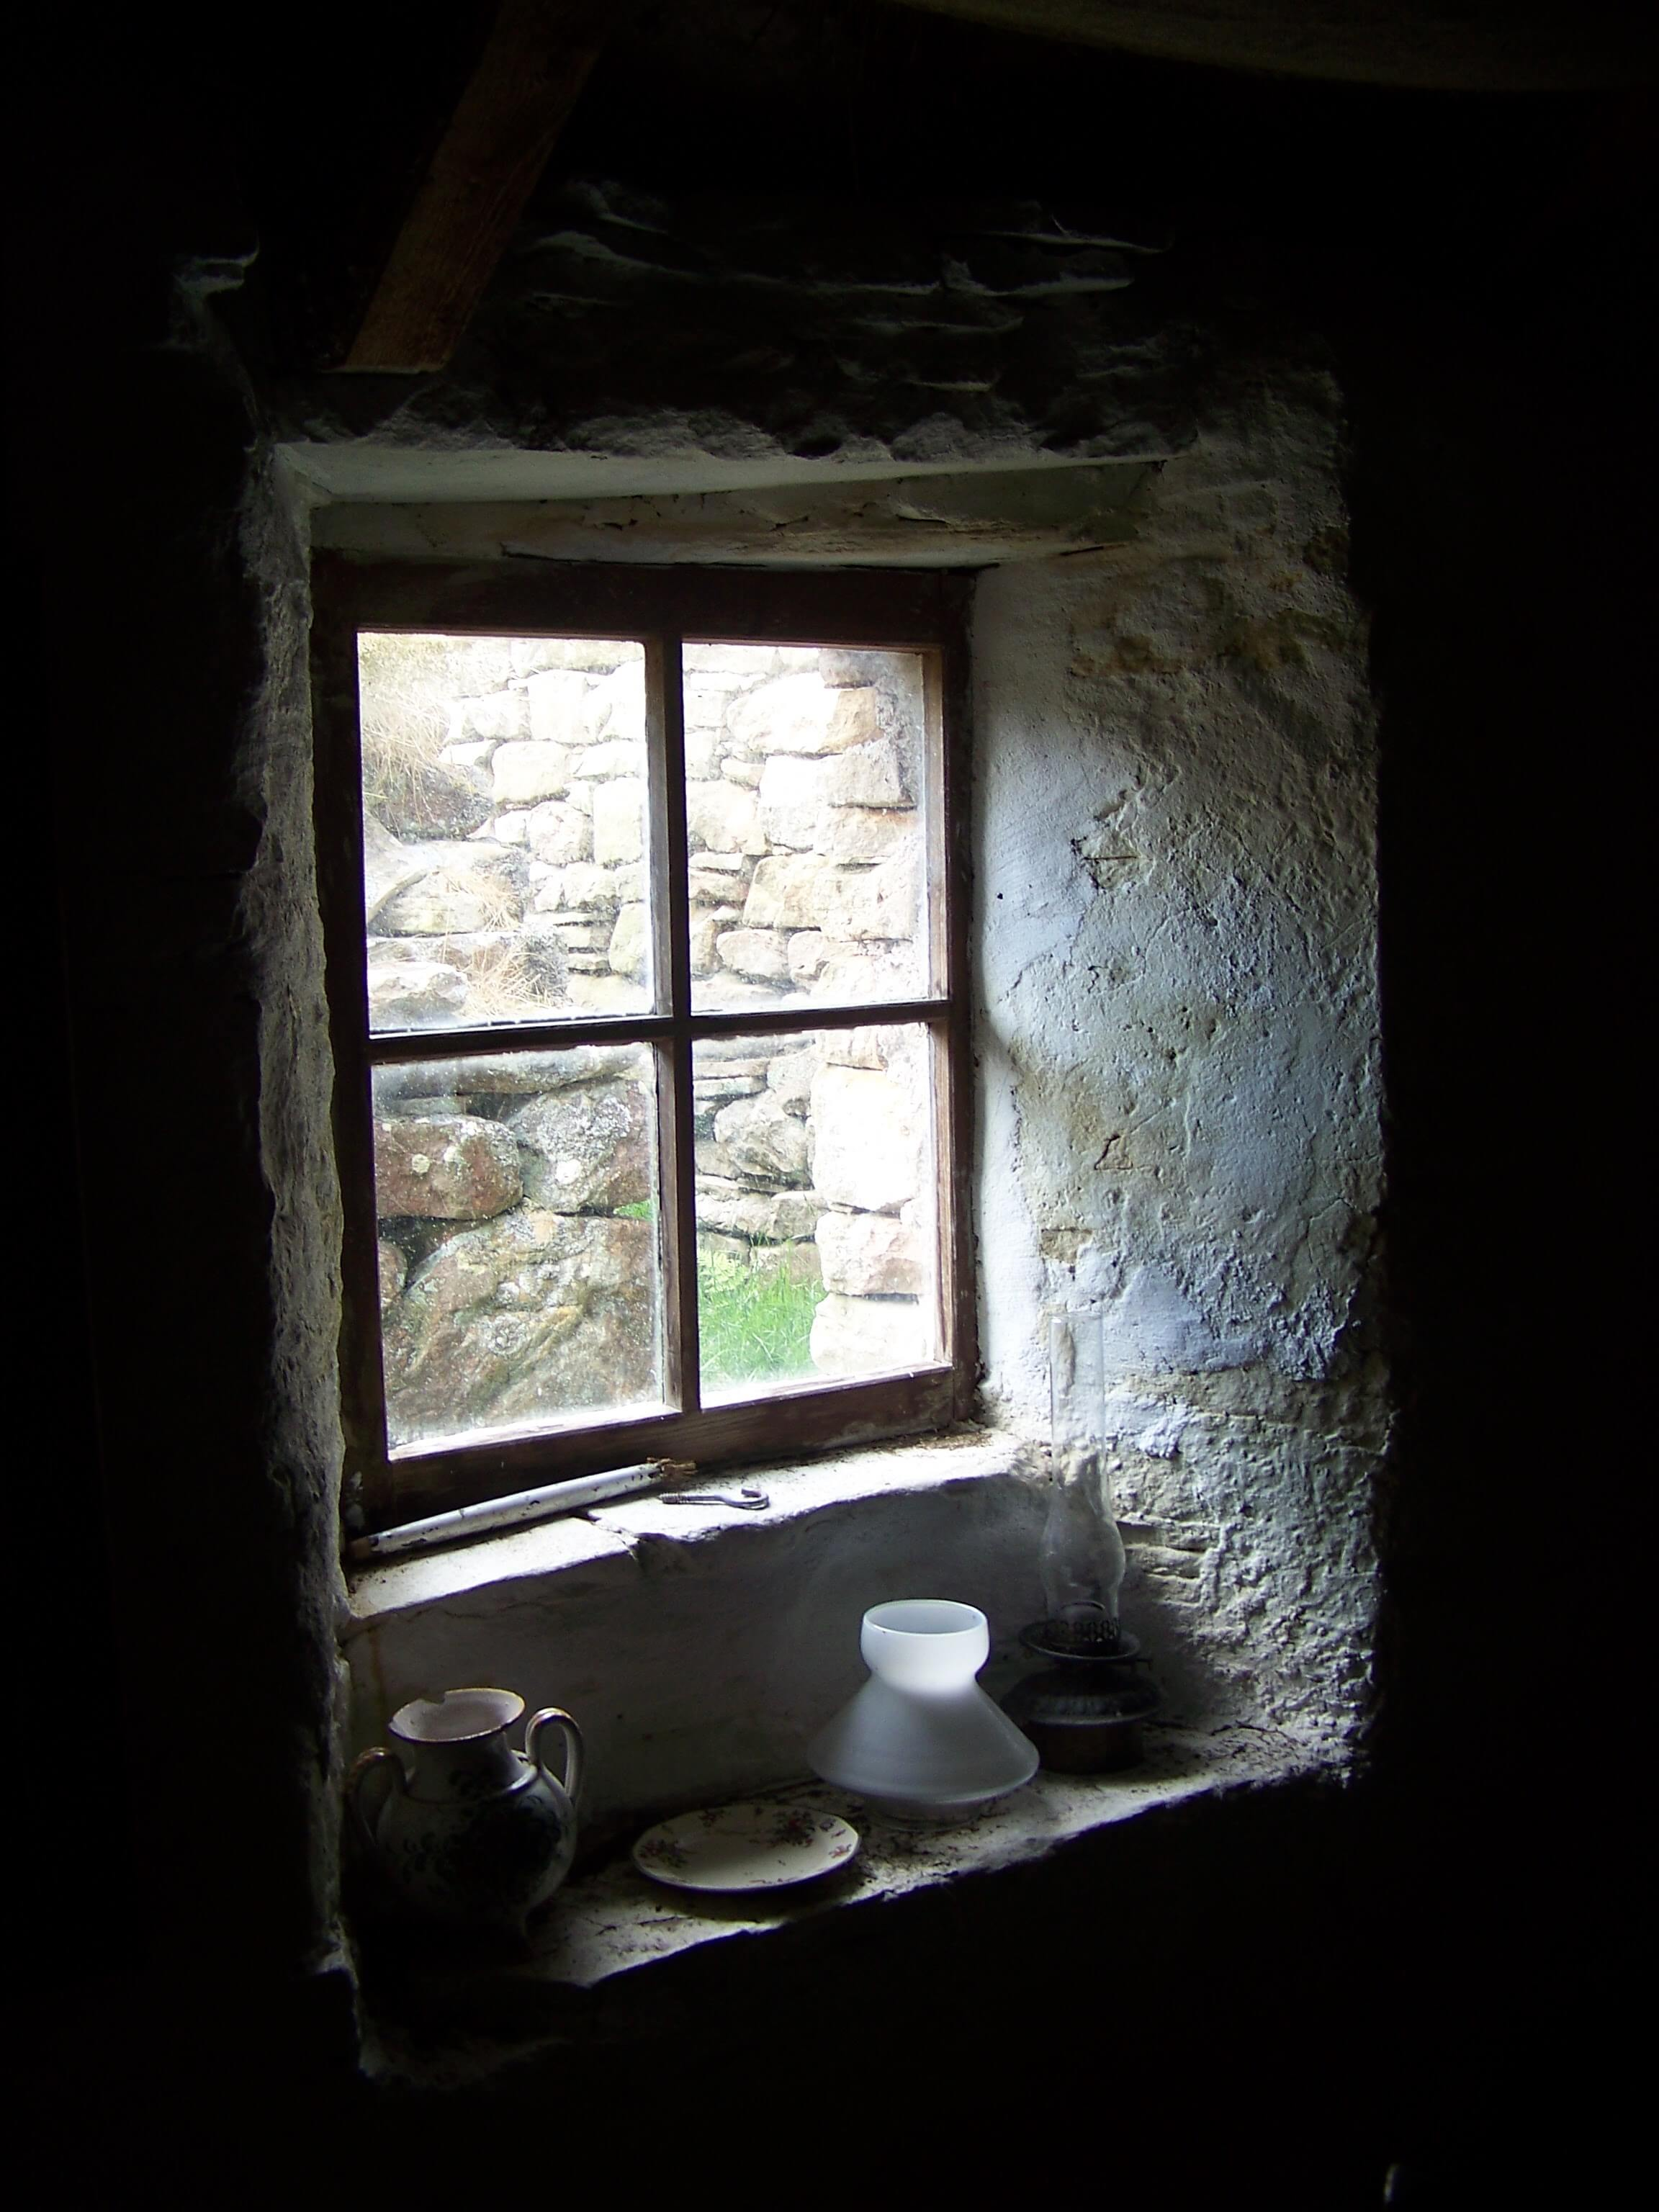 Window in the Craa's Nest Museum, Hoy, Orkney